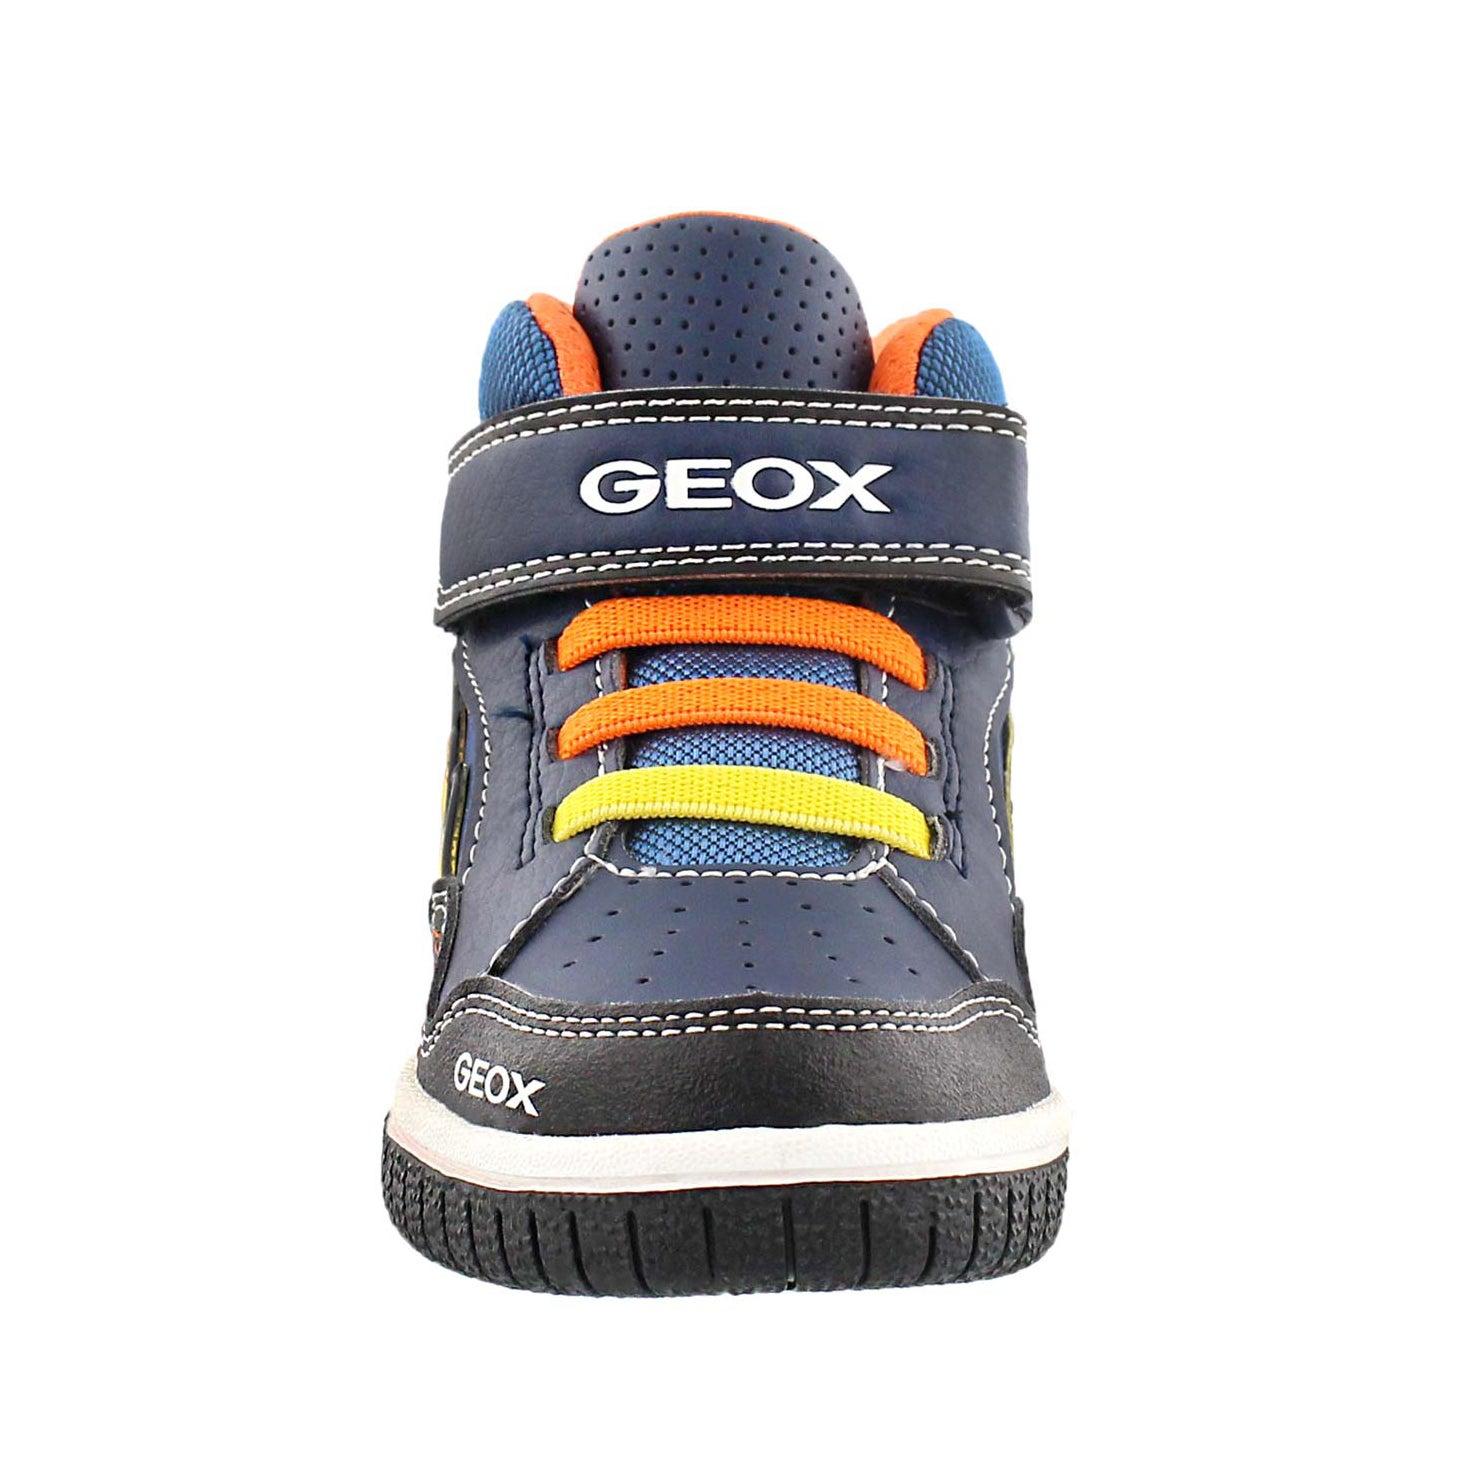 Bys Gregg nvy/orange hi-top sneaker